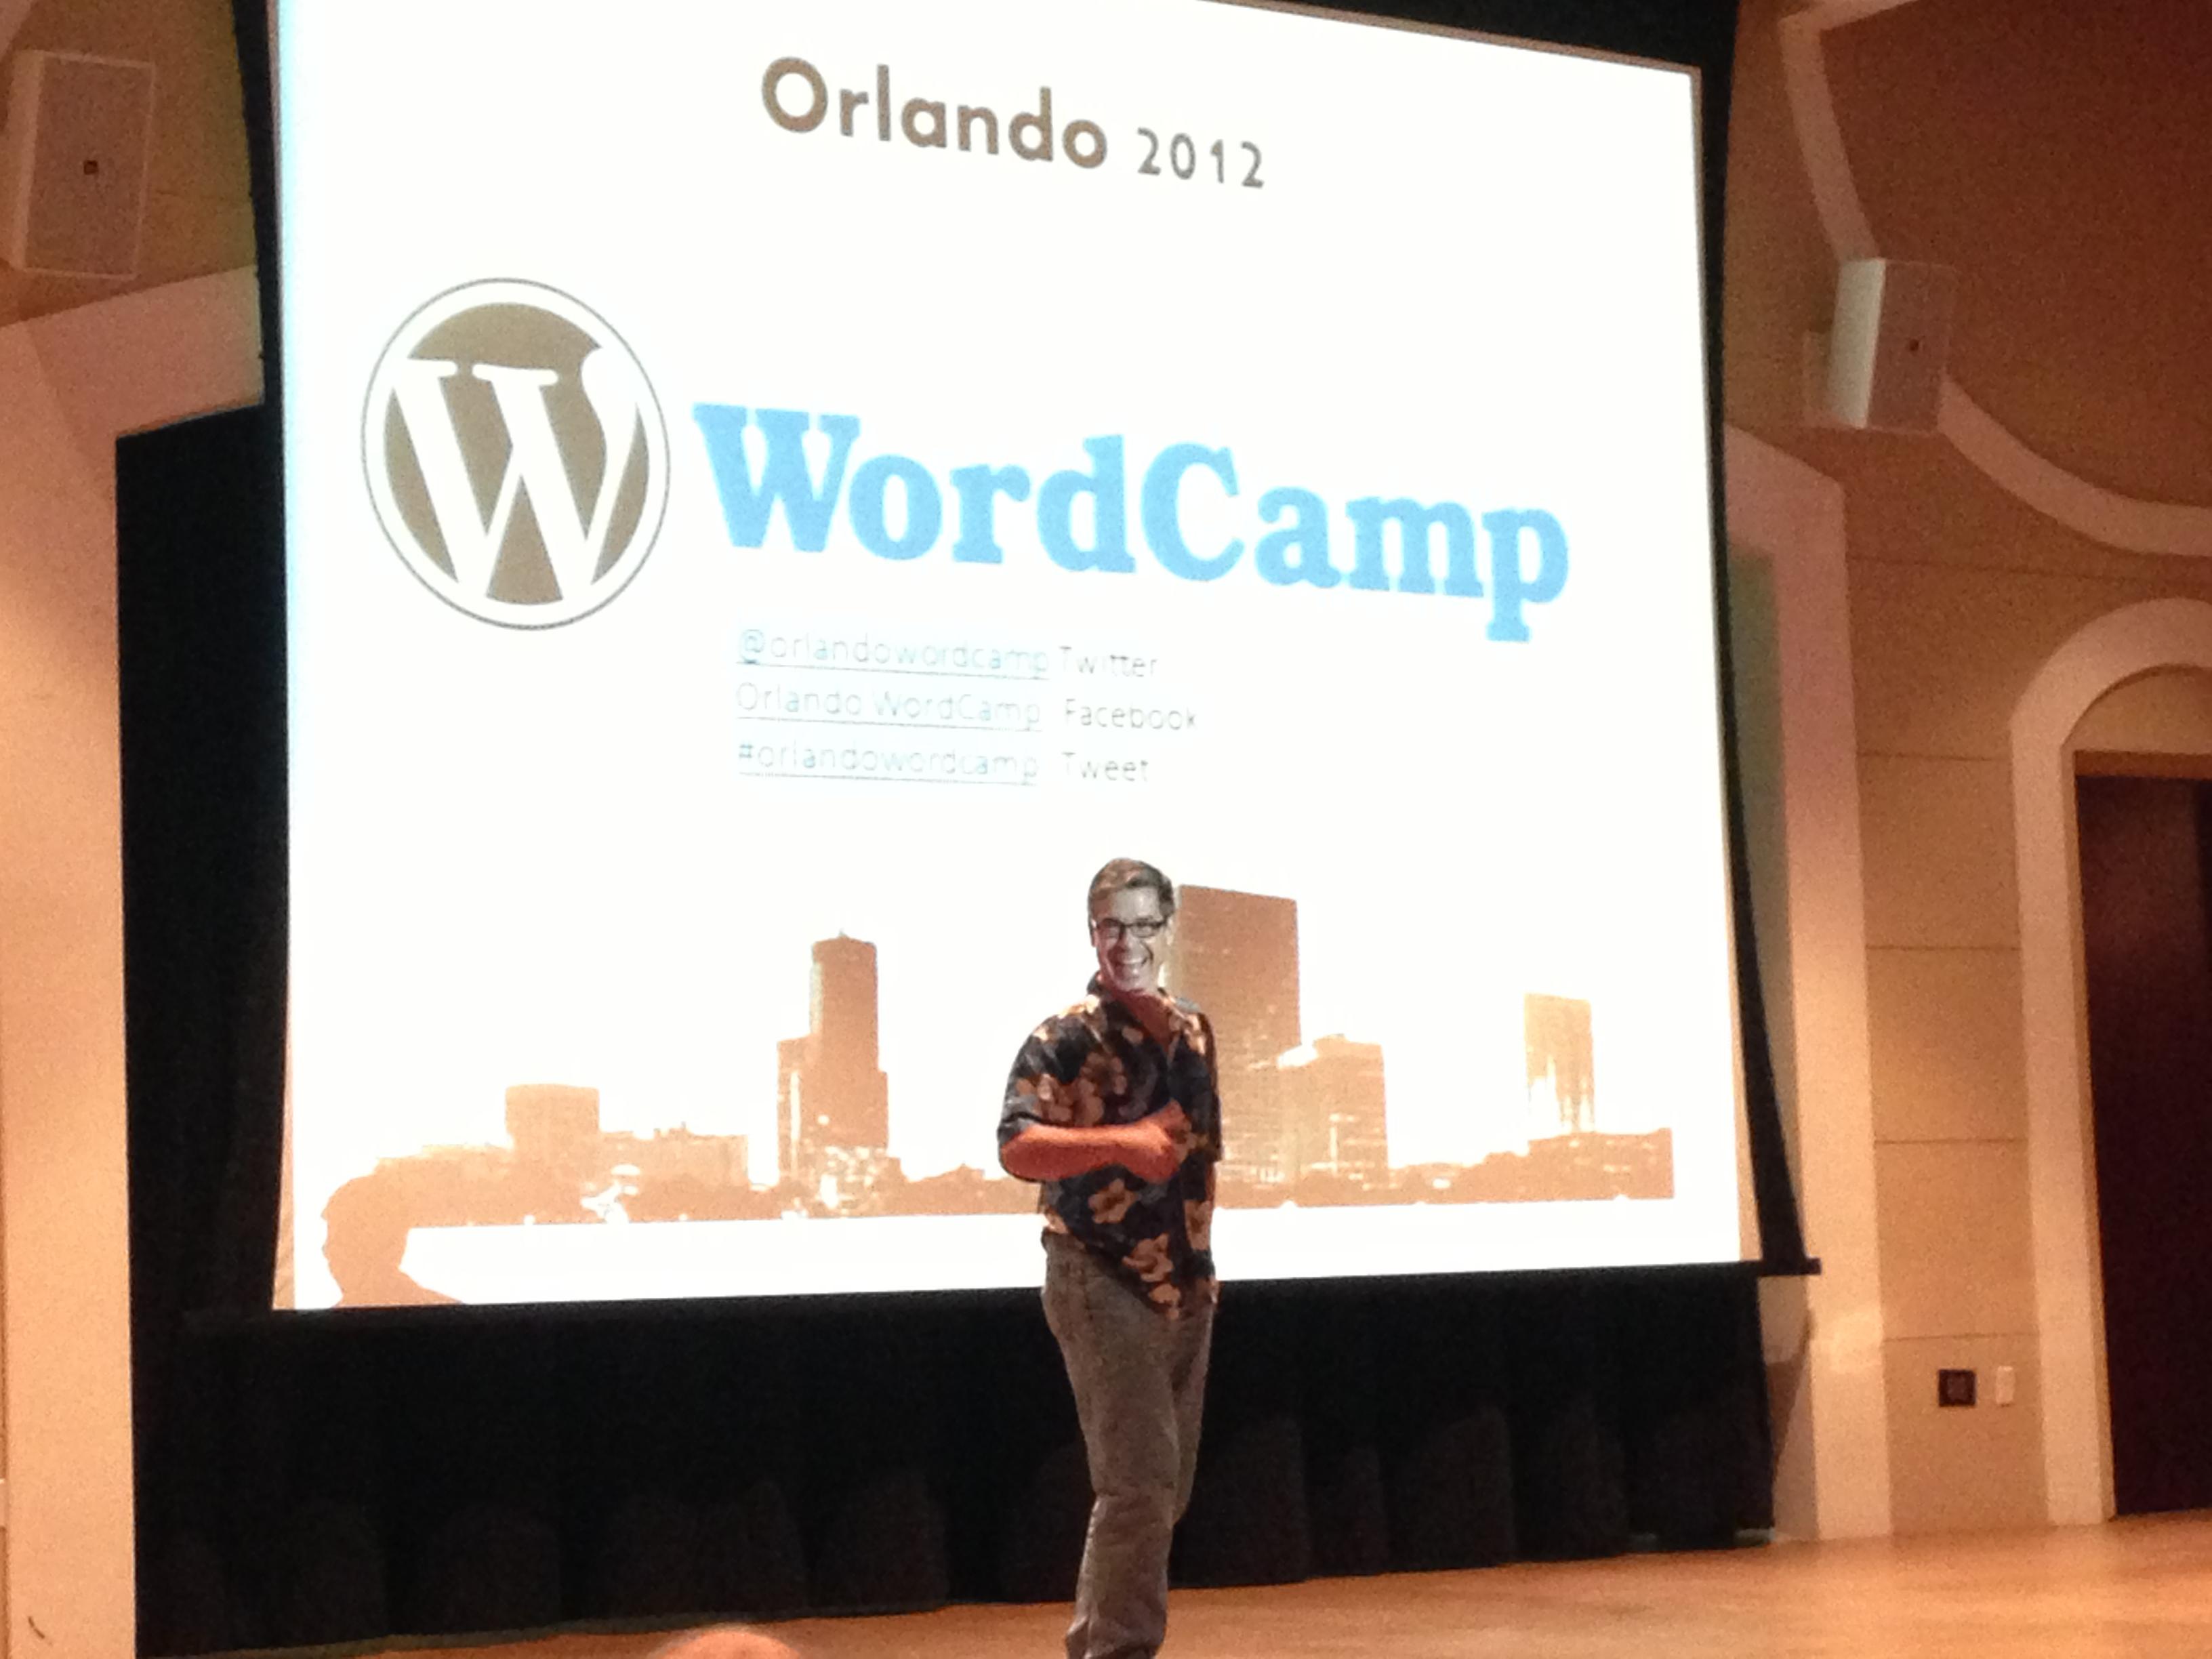 photo of jeff noel on stage at WordCamp Orlando 2012